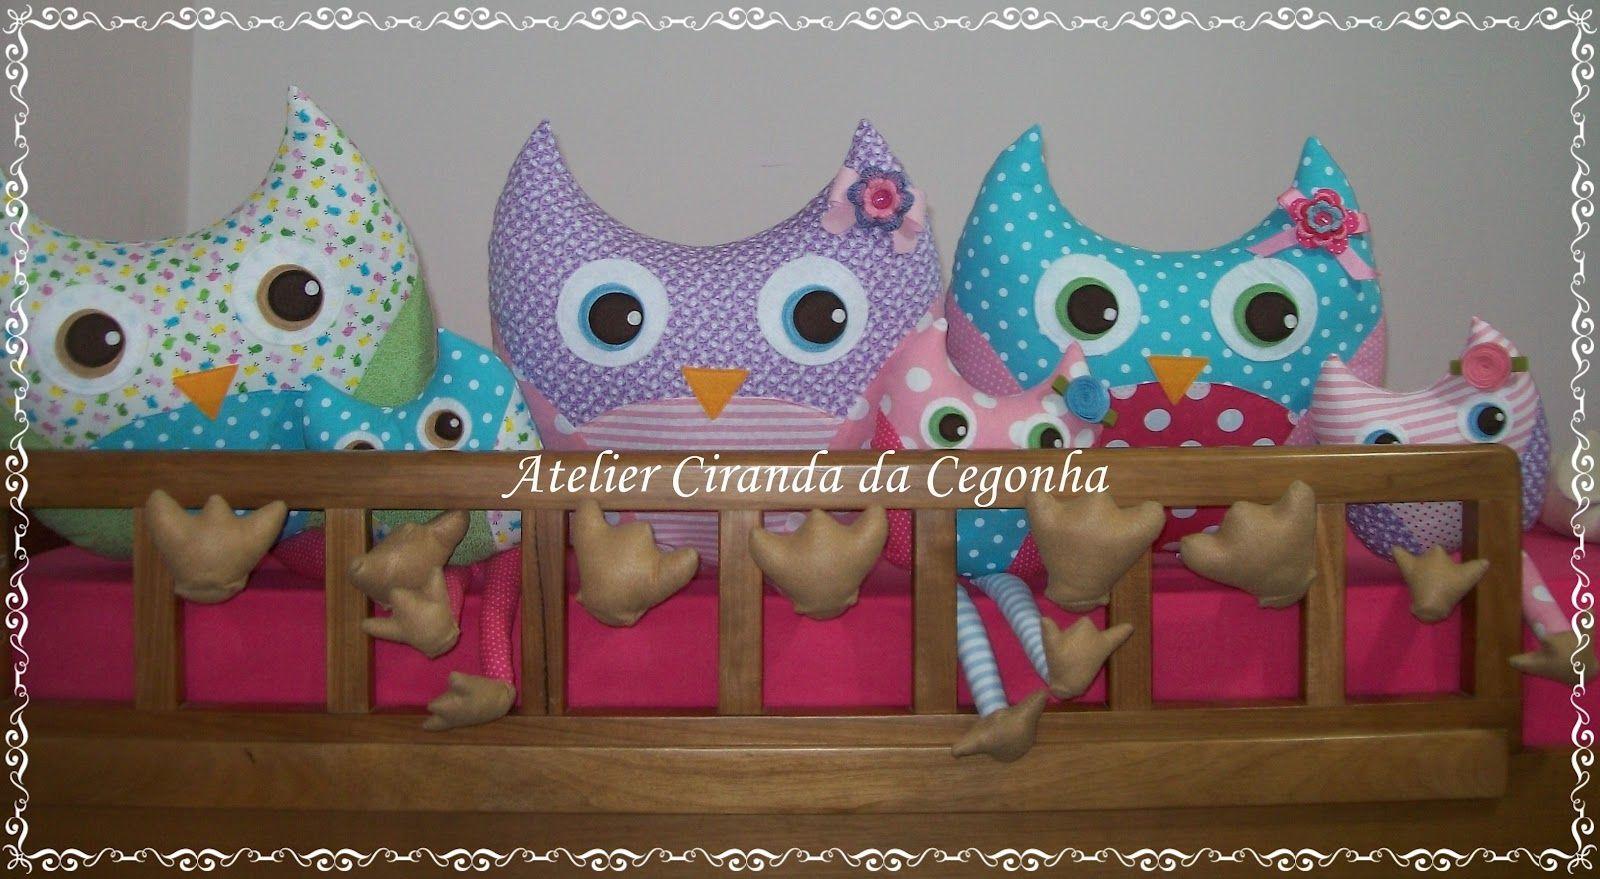 Atelier Ciranda da Cegonha